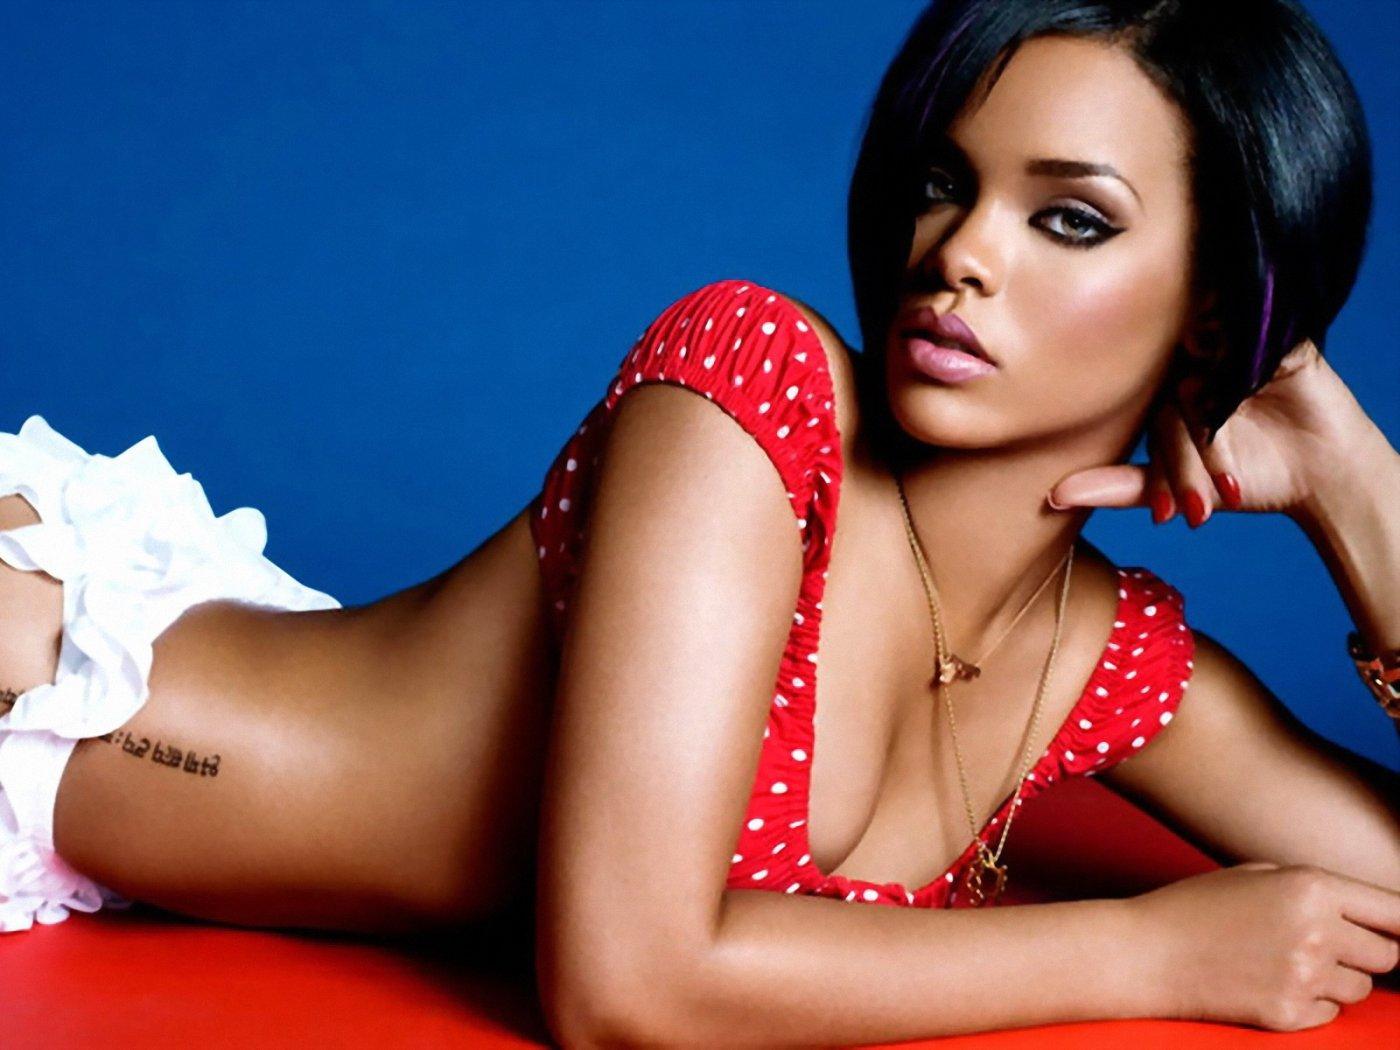 http://4.bp.blogspot.com/-Bj0ICXIn9vI/TyamkRreplI/AAAAAAAAC7o/foiYBk86S2Q/s1600/Rihanna-Wallpapers-2.jpg